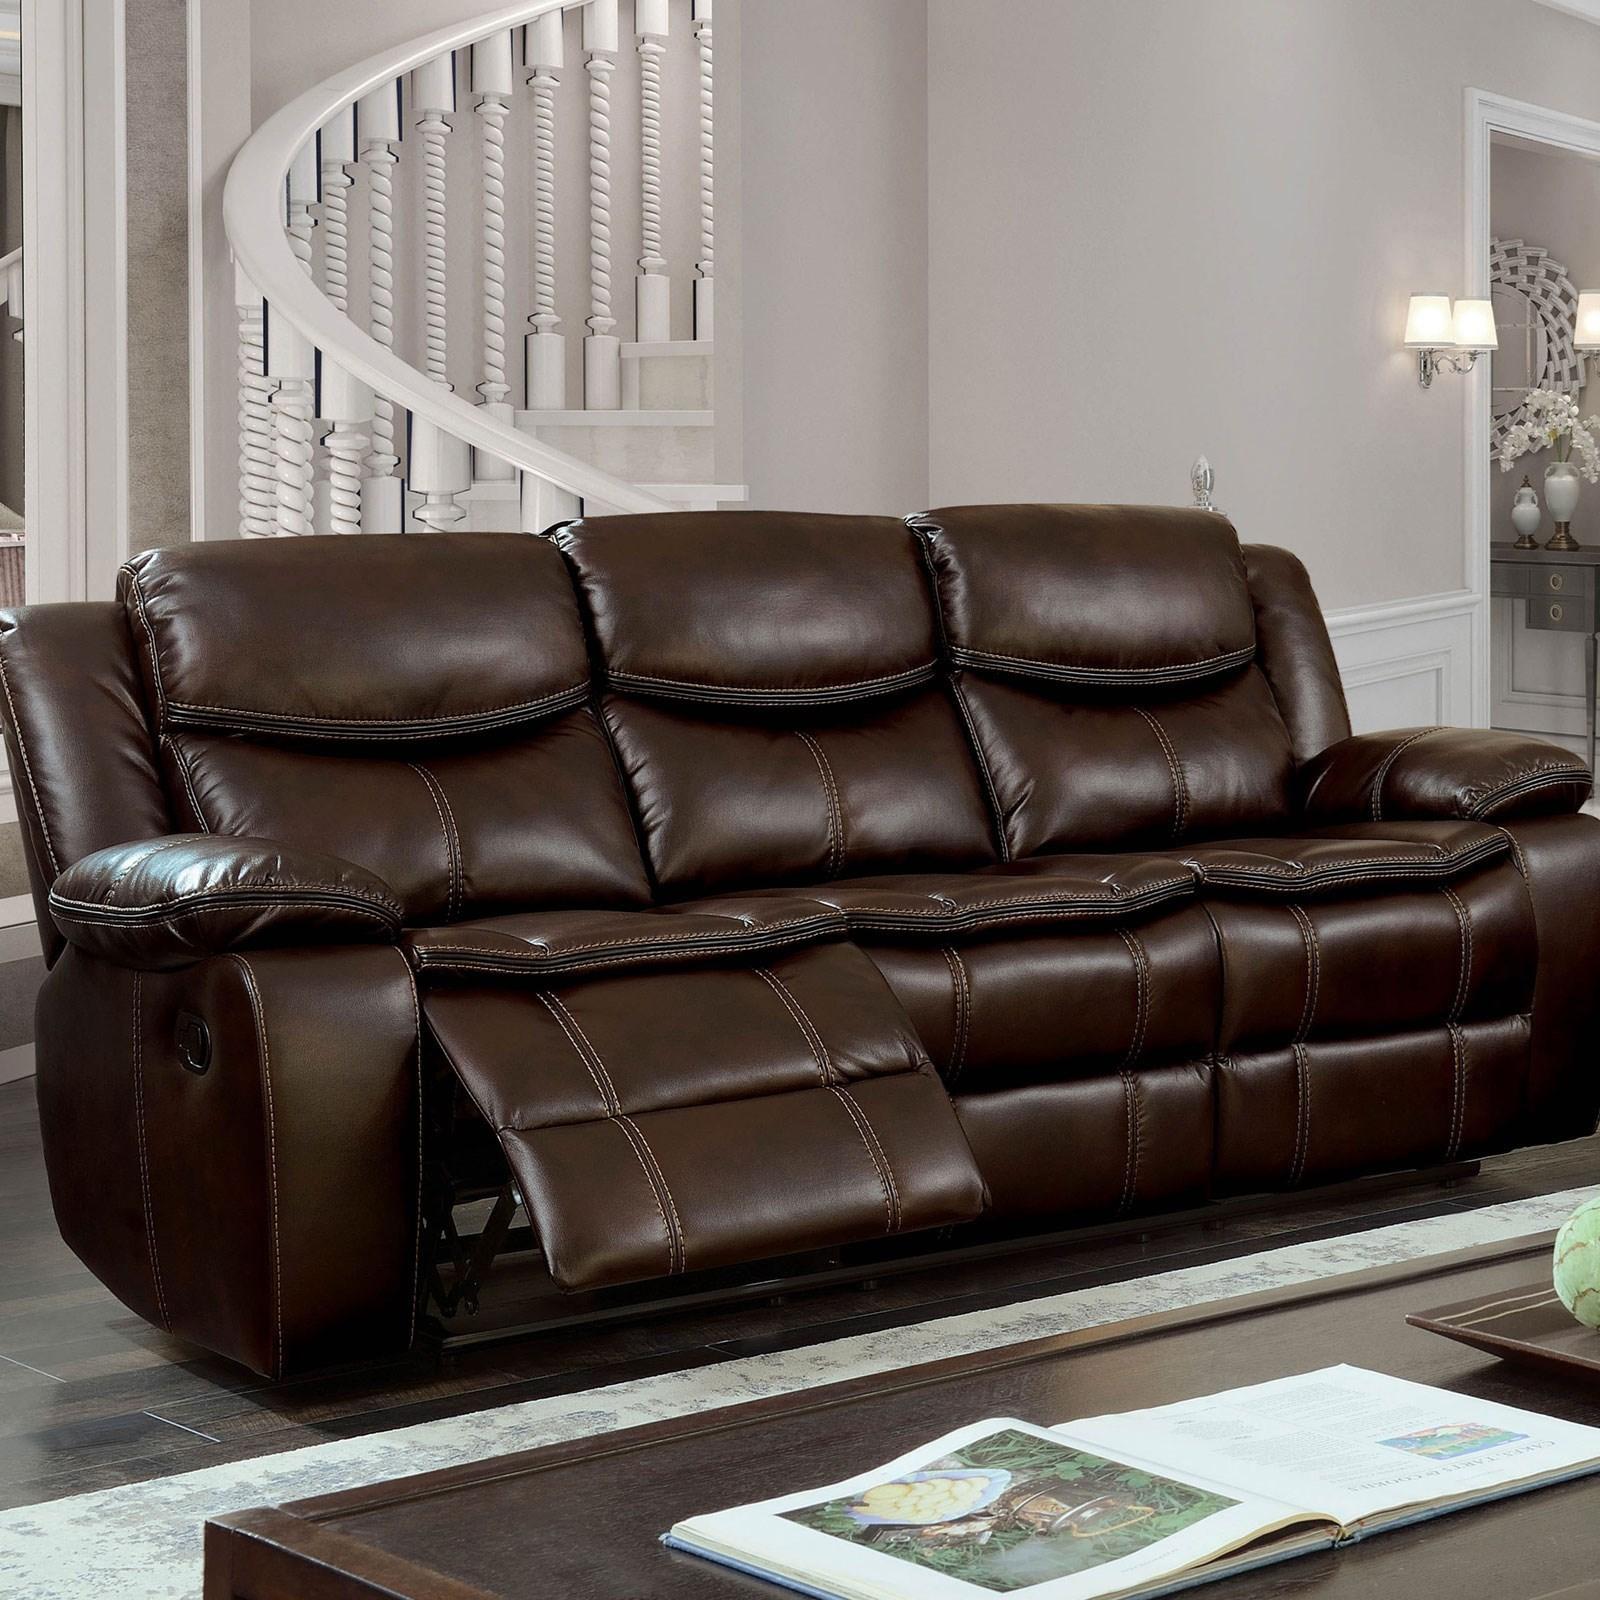 Gatria Sofa w/ 2 Recliners by Furniture of America at Dream Home Interiors